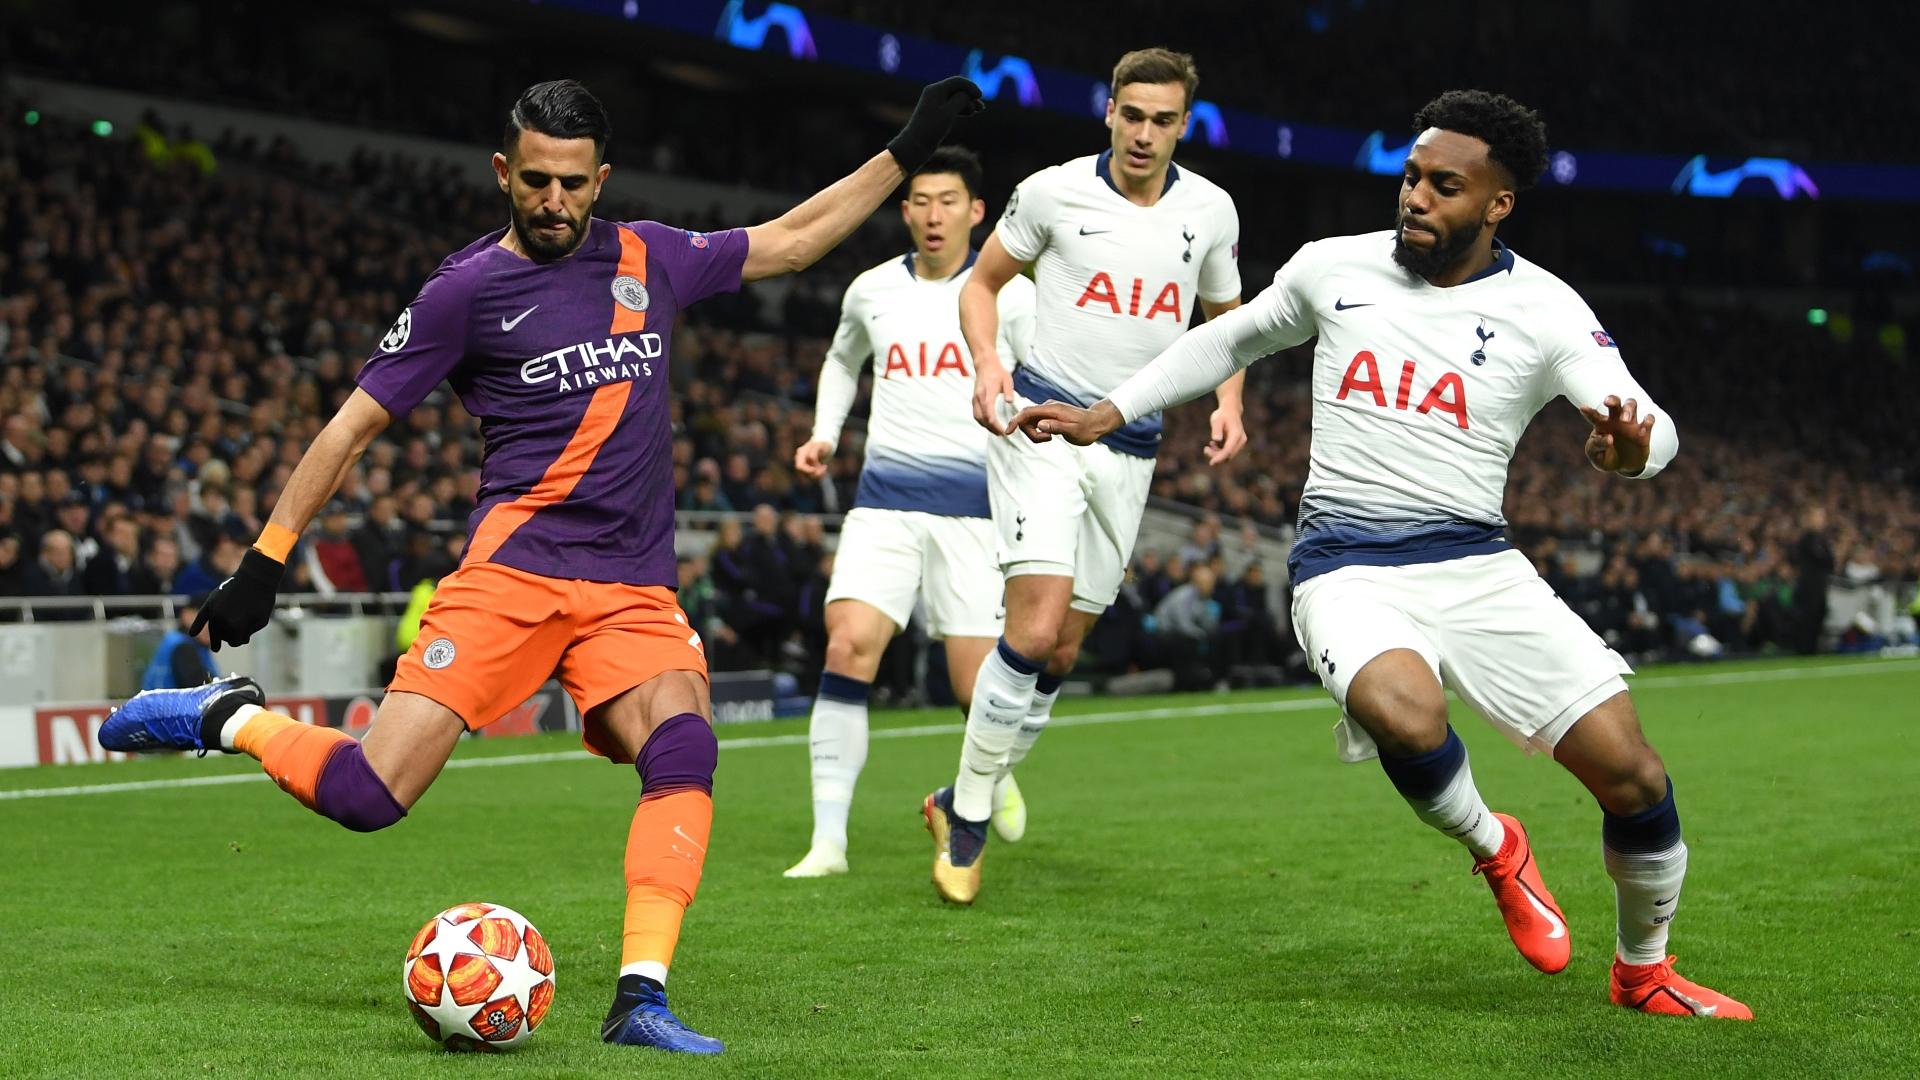 Riyad Mahrez, Tottenham vs Man City, UCL 2018-19